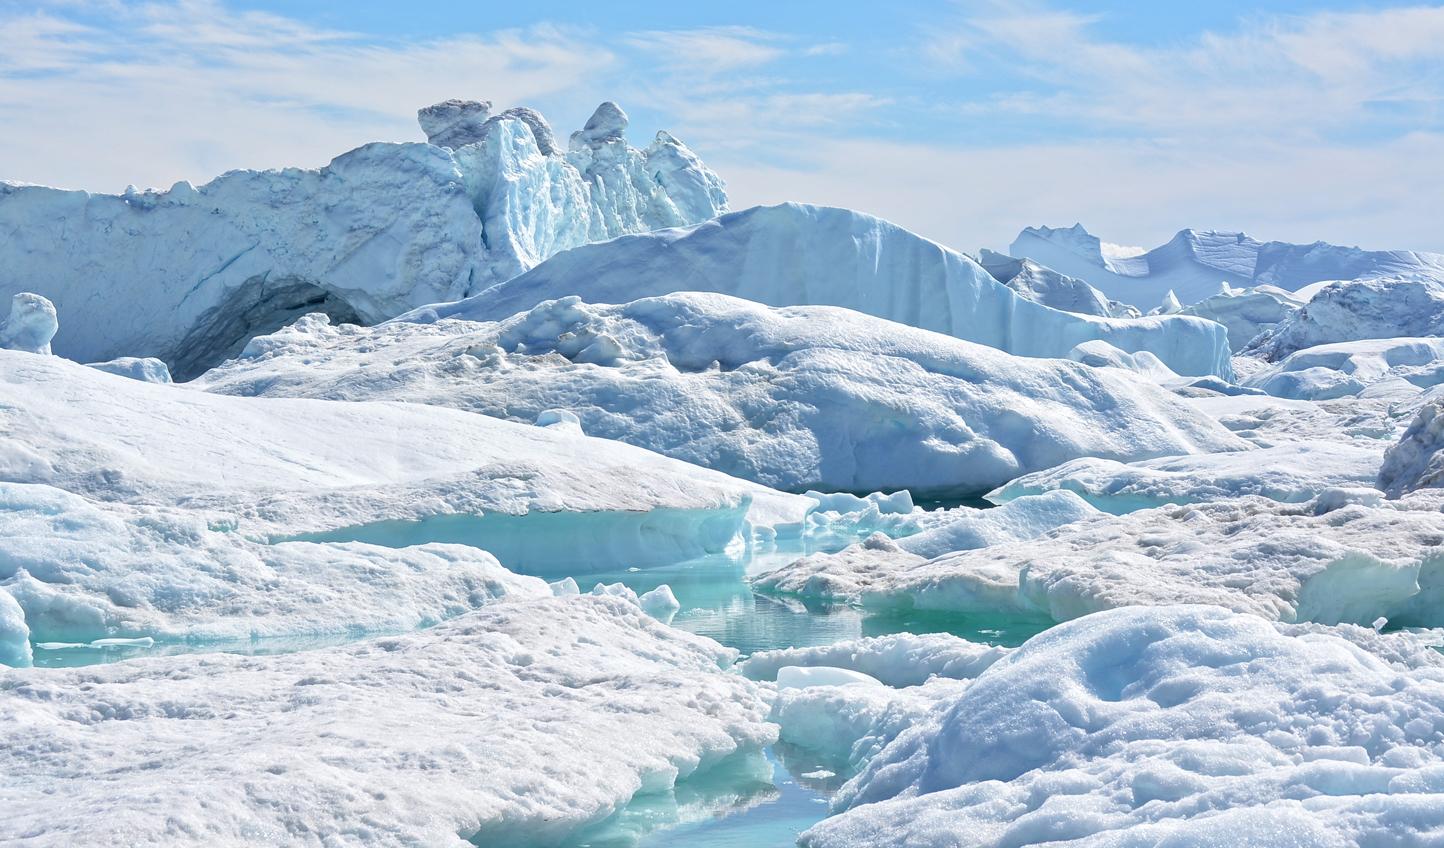 Disco Bay, swarmed with beautiful icebergs